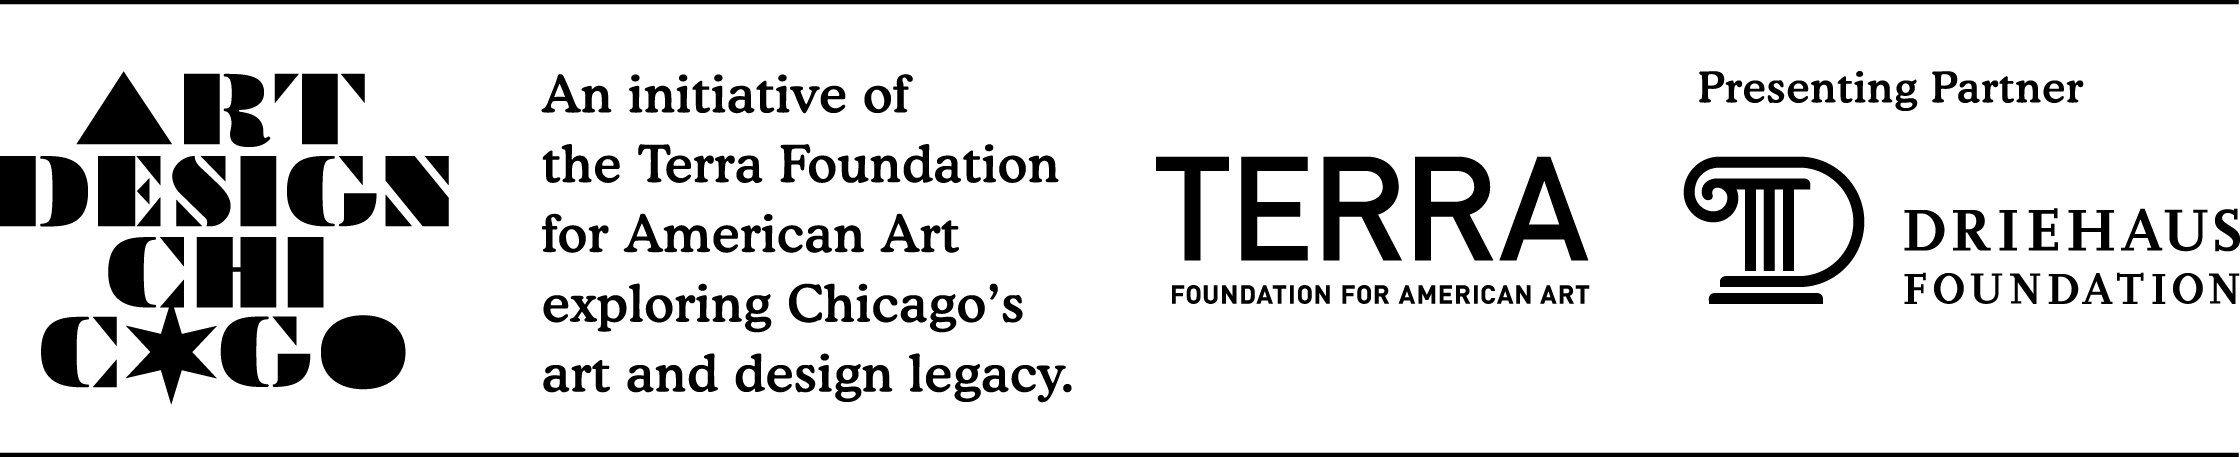 ADC-Lockup-Row-Medium-Black.png